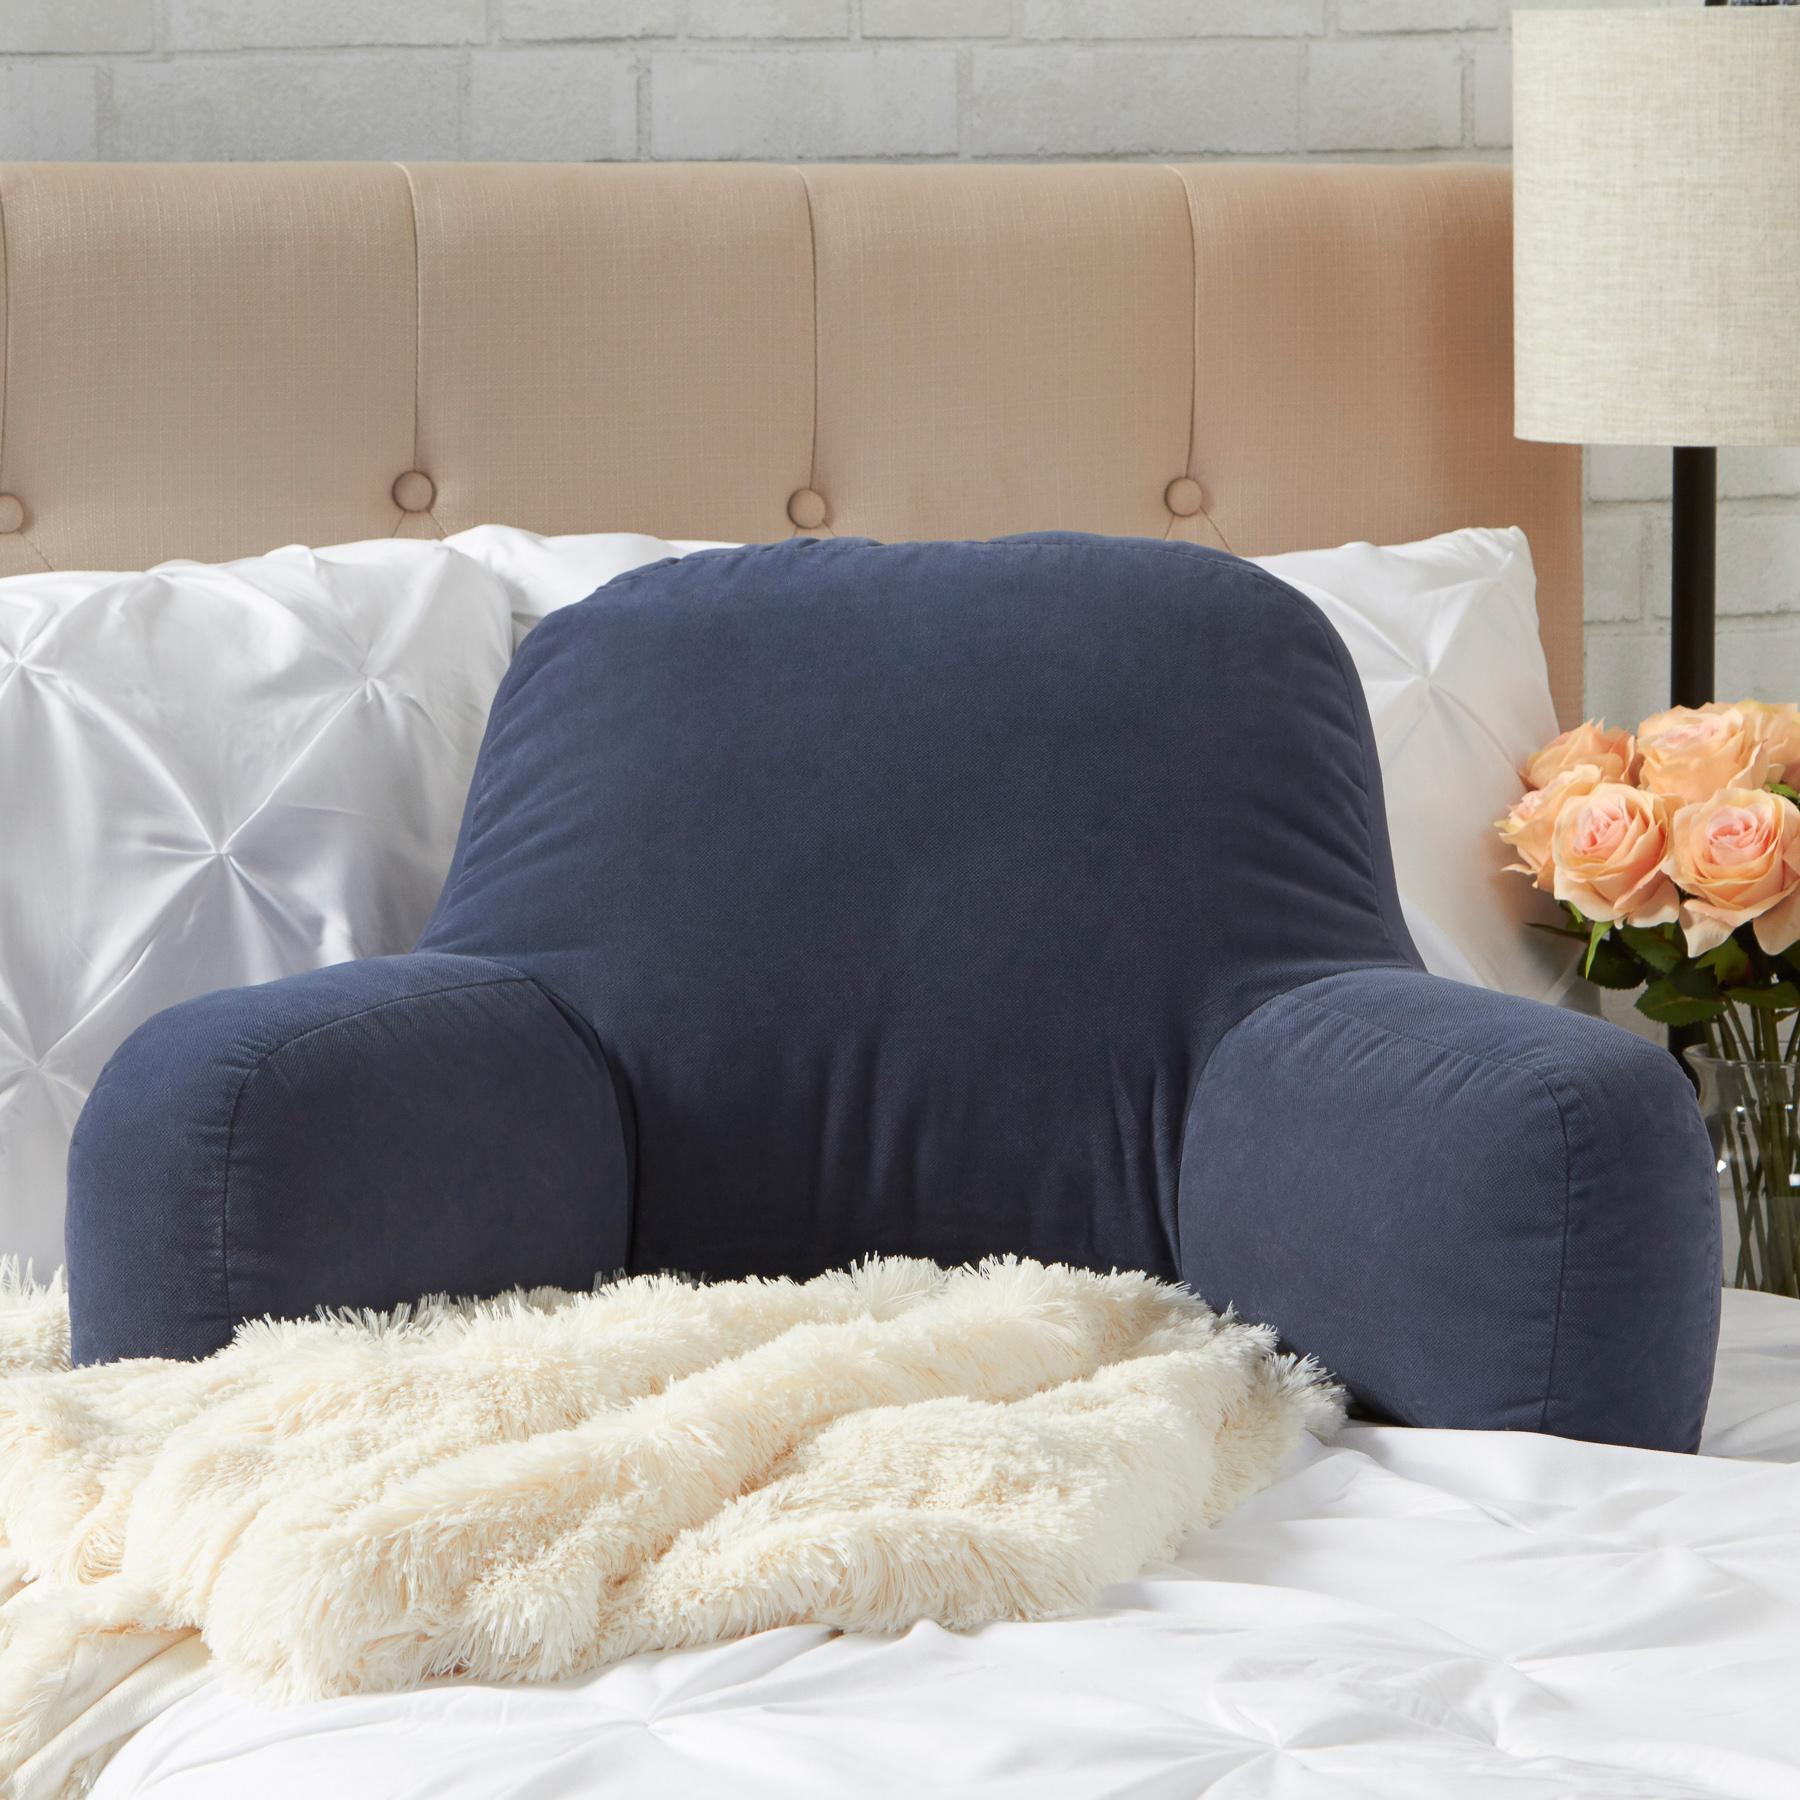 Hyatt 28 x 17 in. Bed Rest Pillow